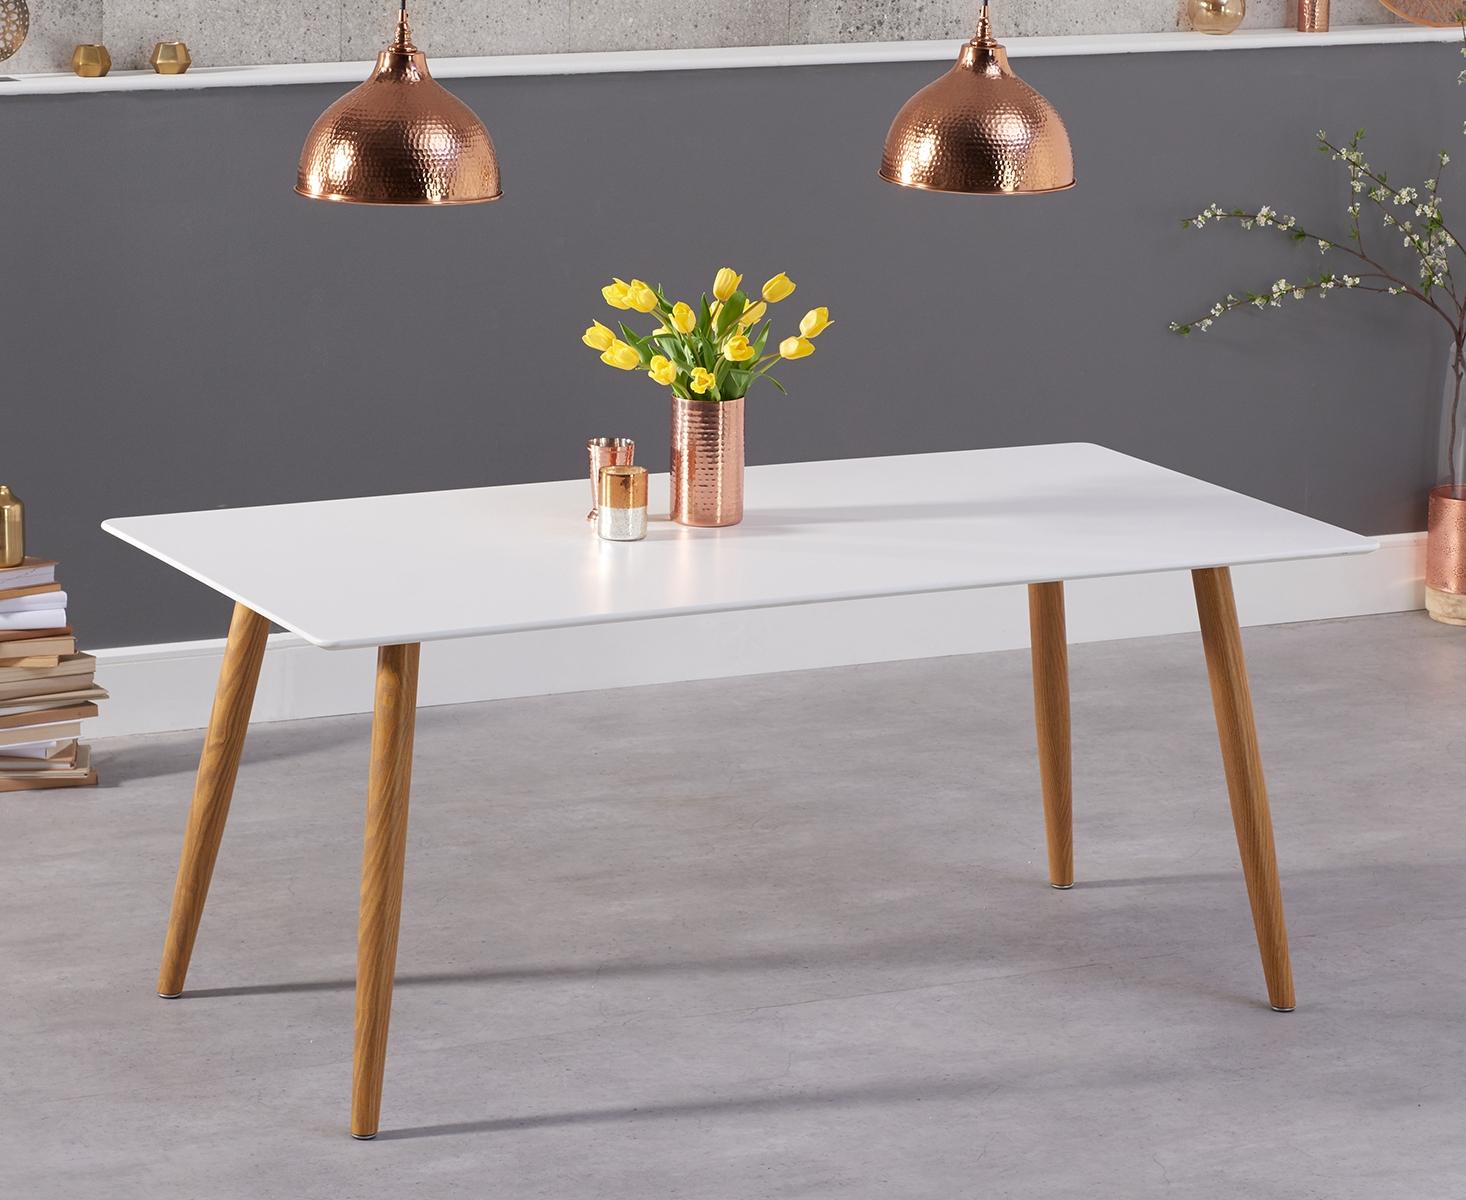 An image of Maida Vale 180cm Matt White Dining Table